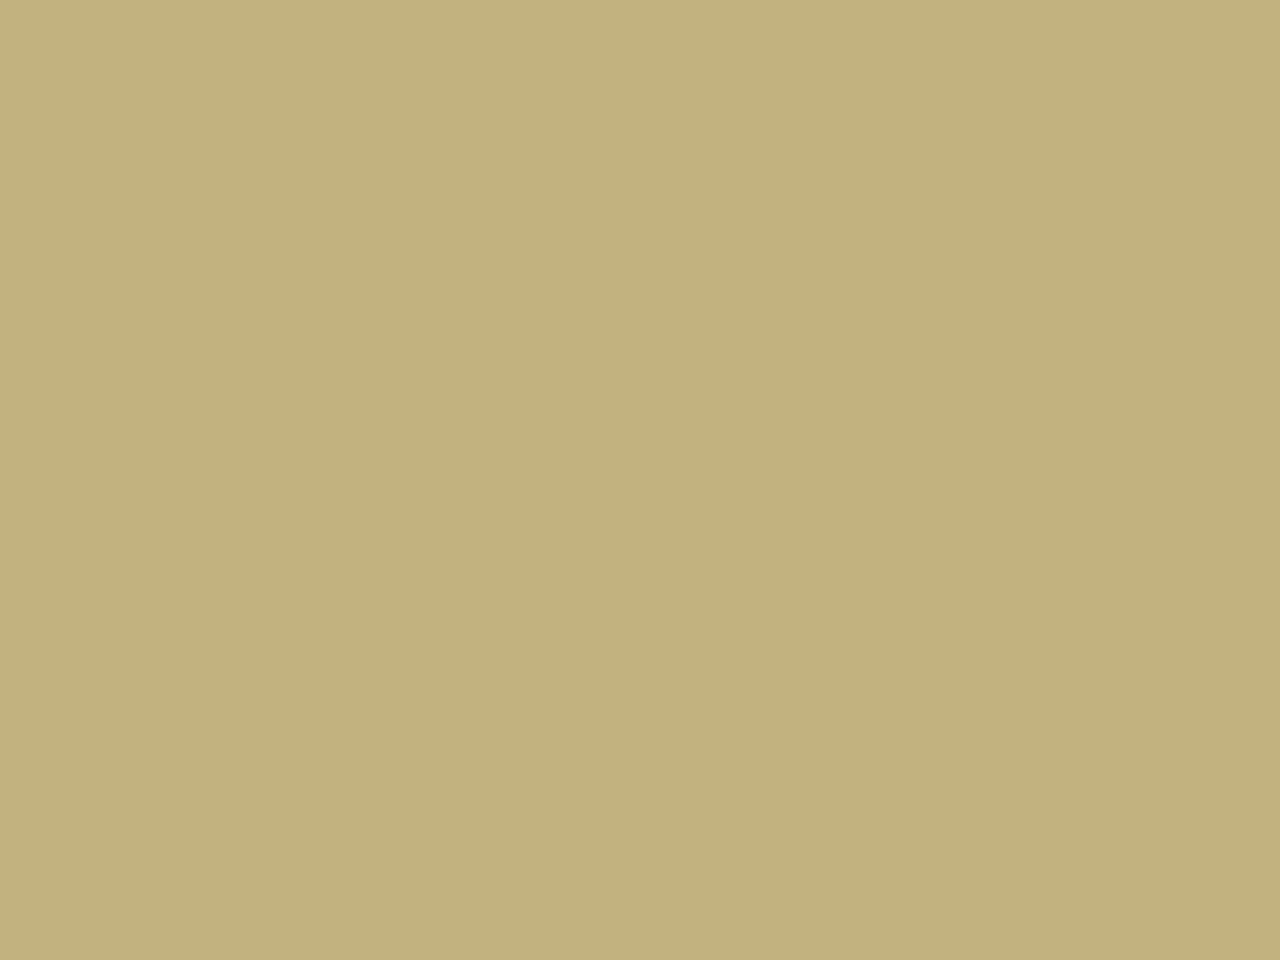 1280x960 Ecru Solid Color Background